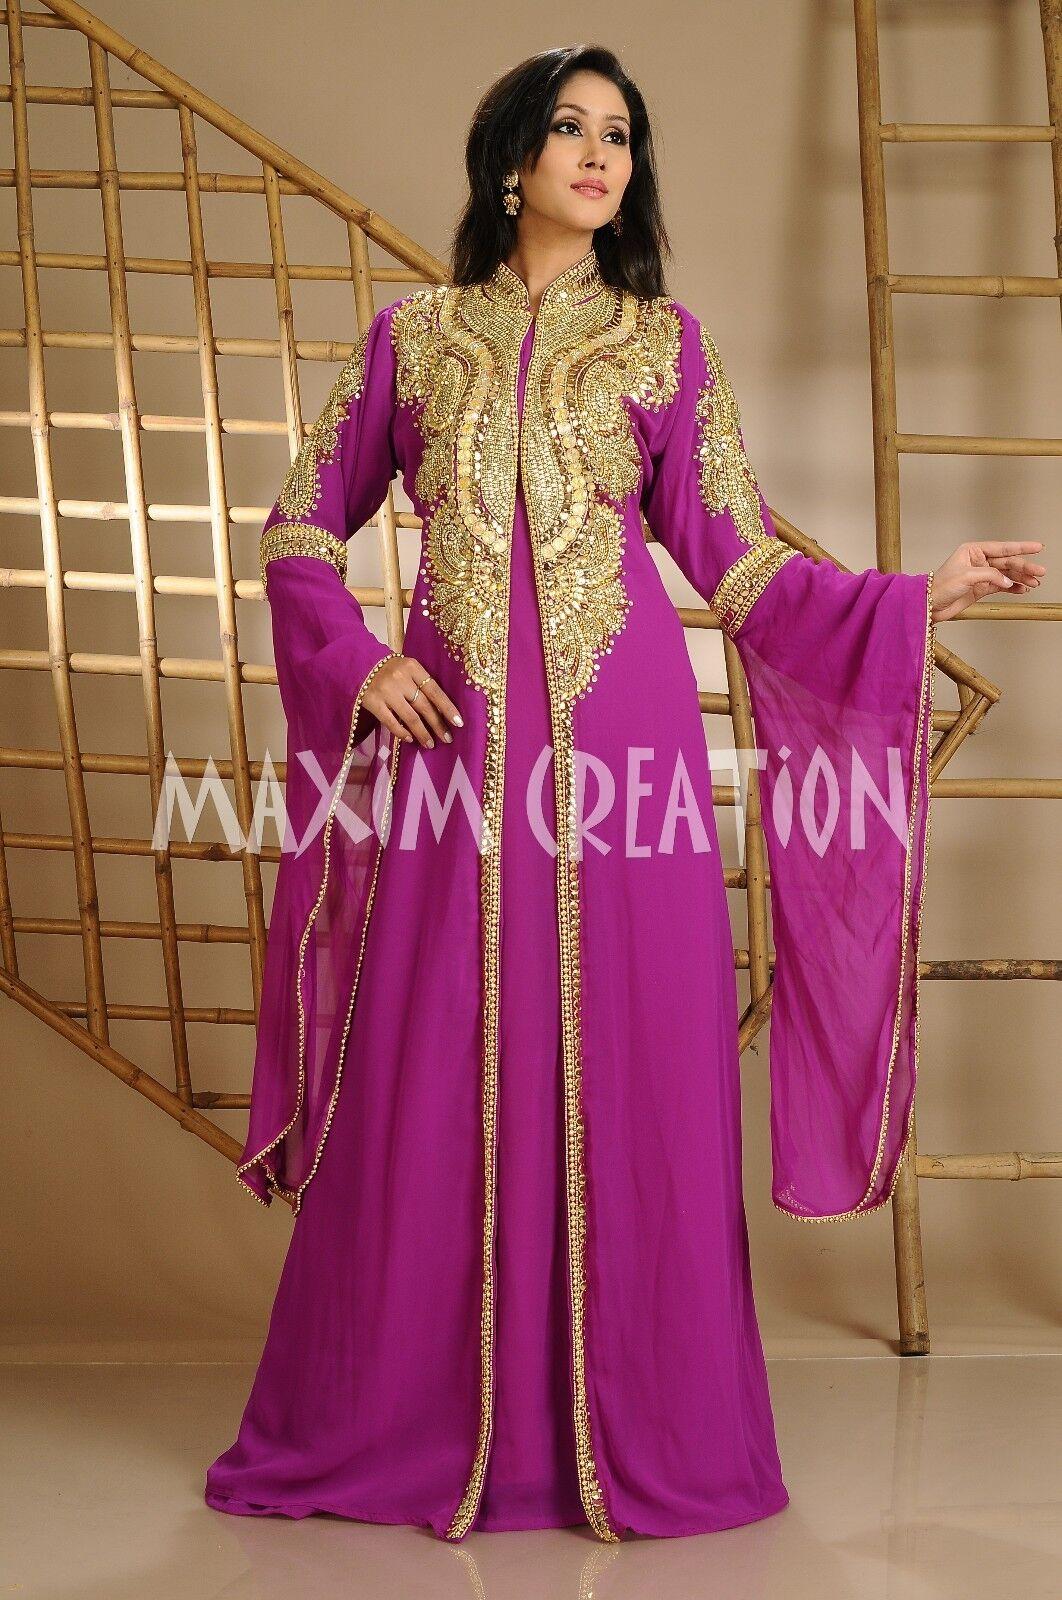 DUBAI FANCY KAFTAN WEDDING GOWN ARABIAN DRESS THOBE JALABIYA JILBAB JILBAB JILBAB DRESS 3591 a247f1